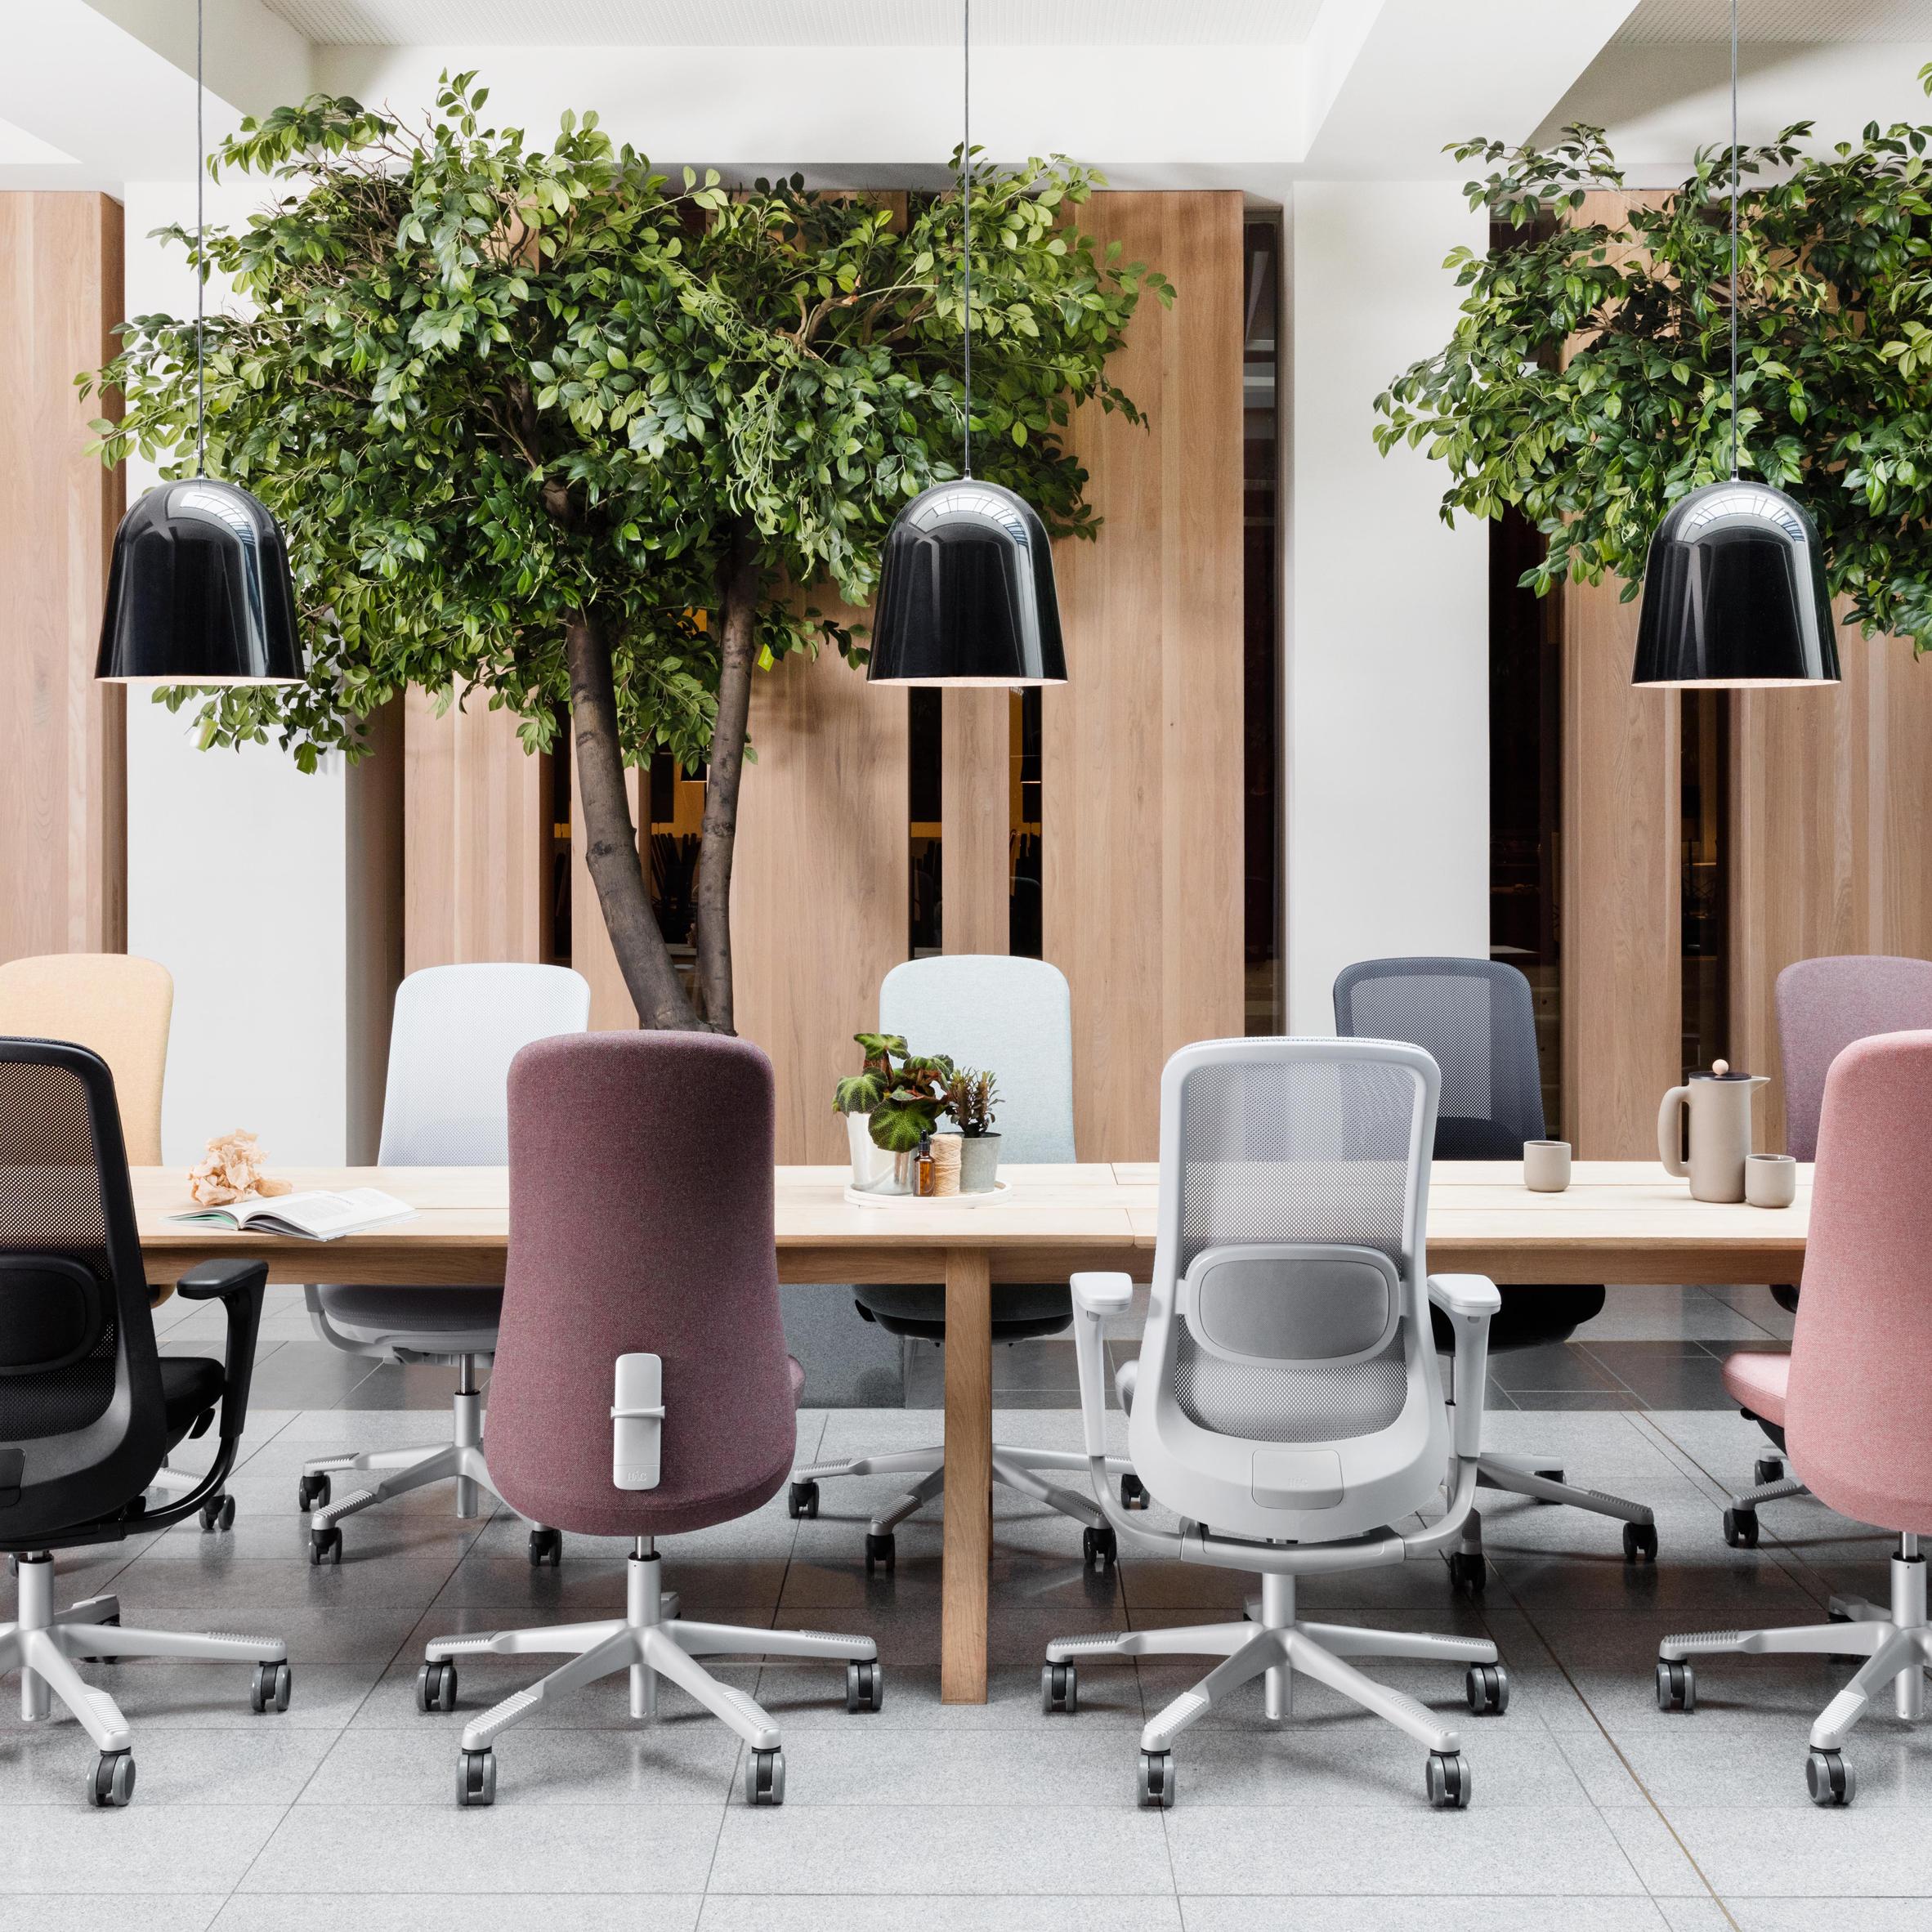 HÅG SoFi office chair by Frost Produkt and Aleksander Borgenhov for Flokk